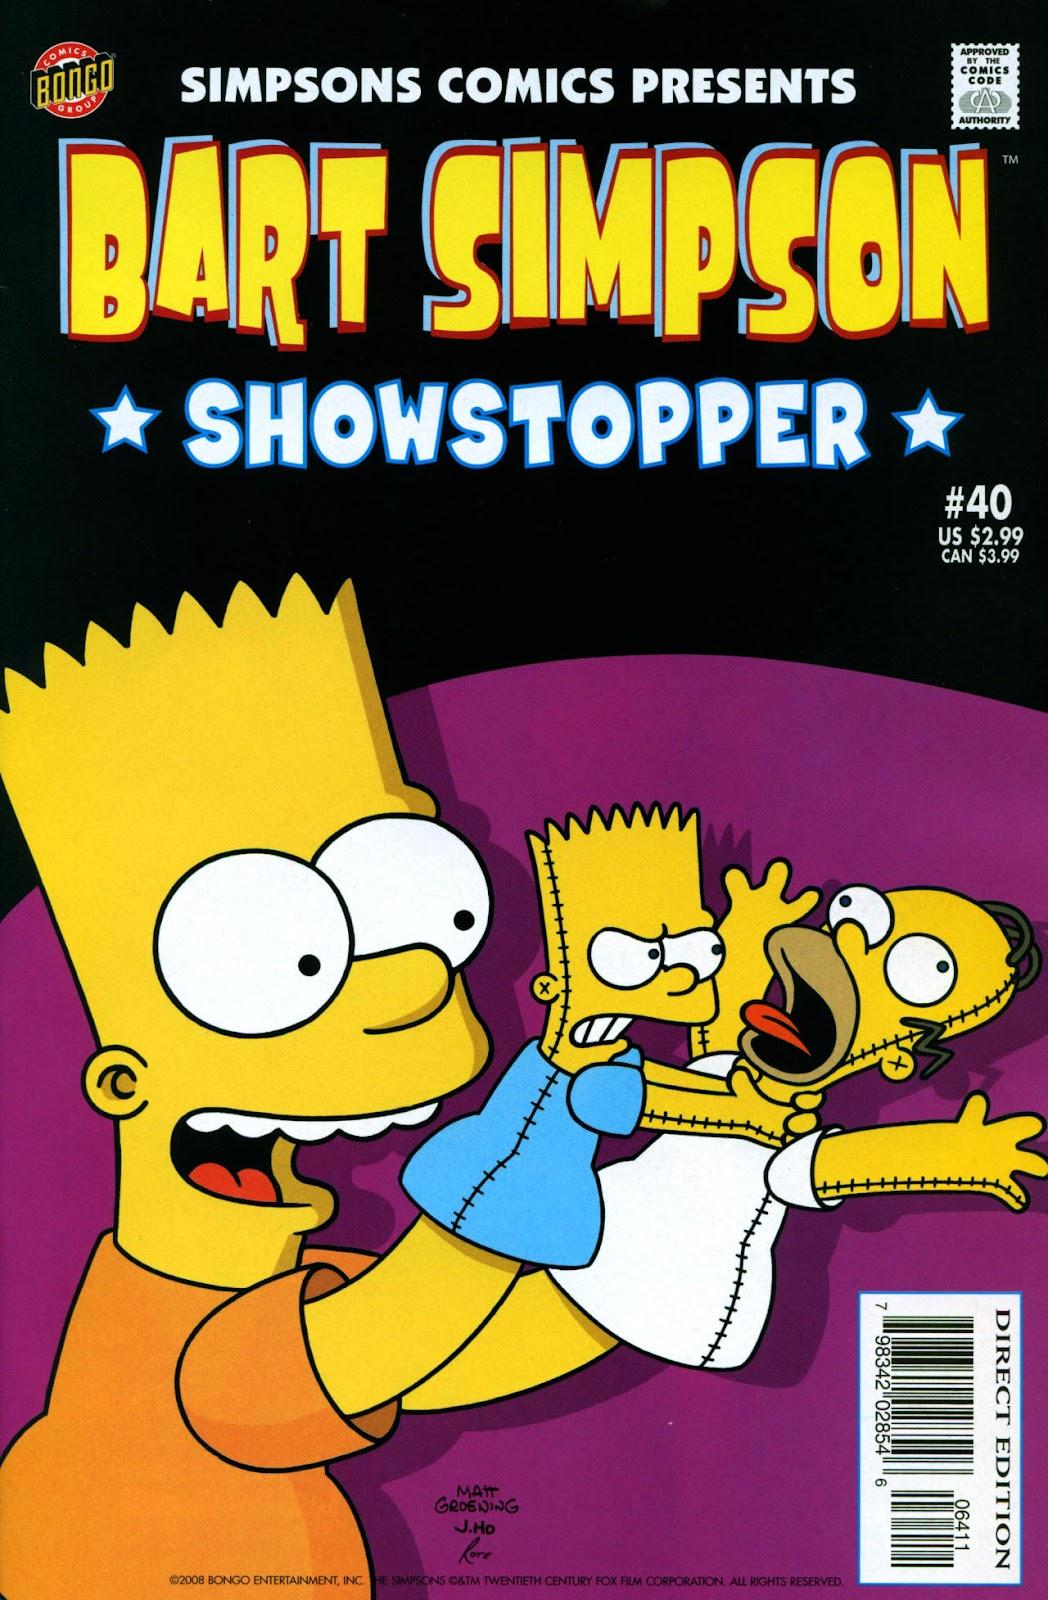 Simpsons Comics Presents Bart Simpson 40 Page 1